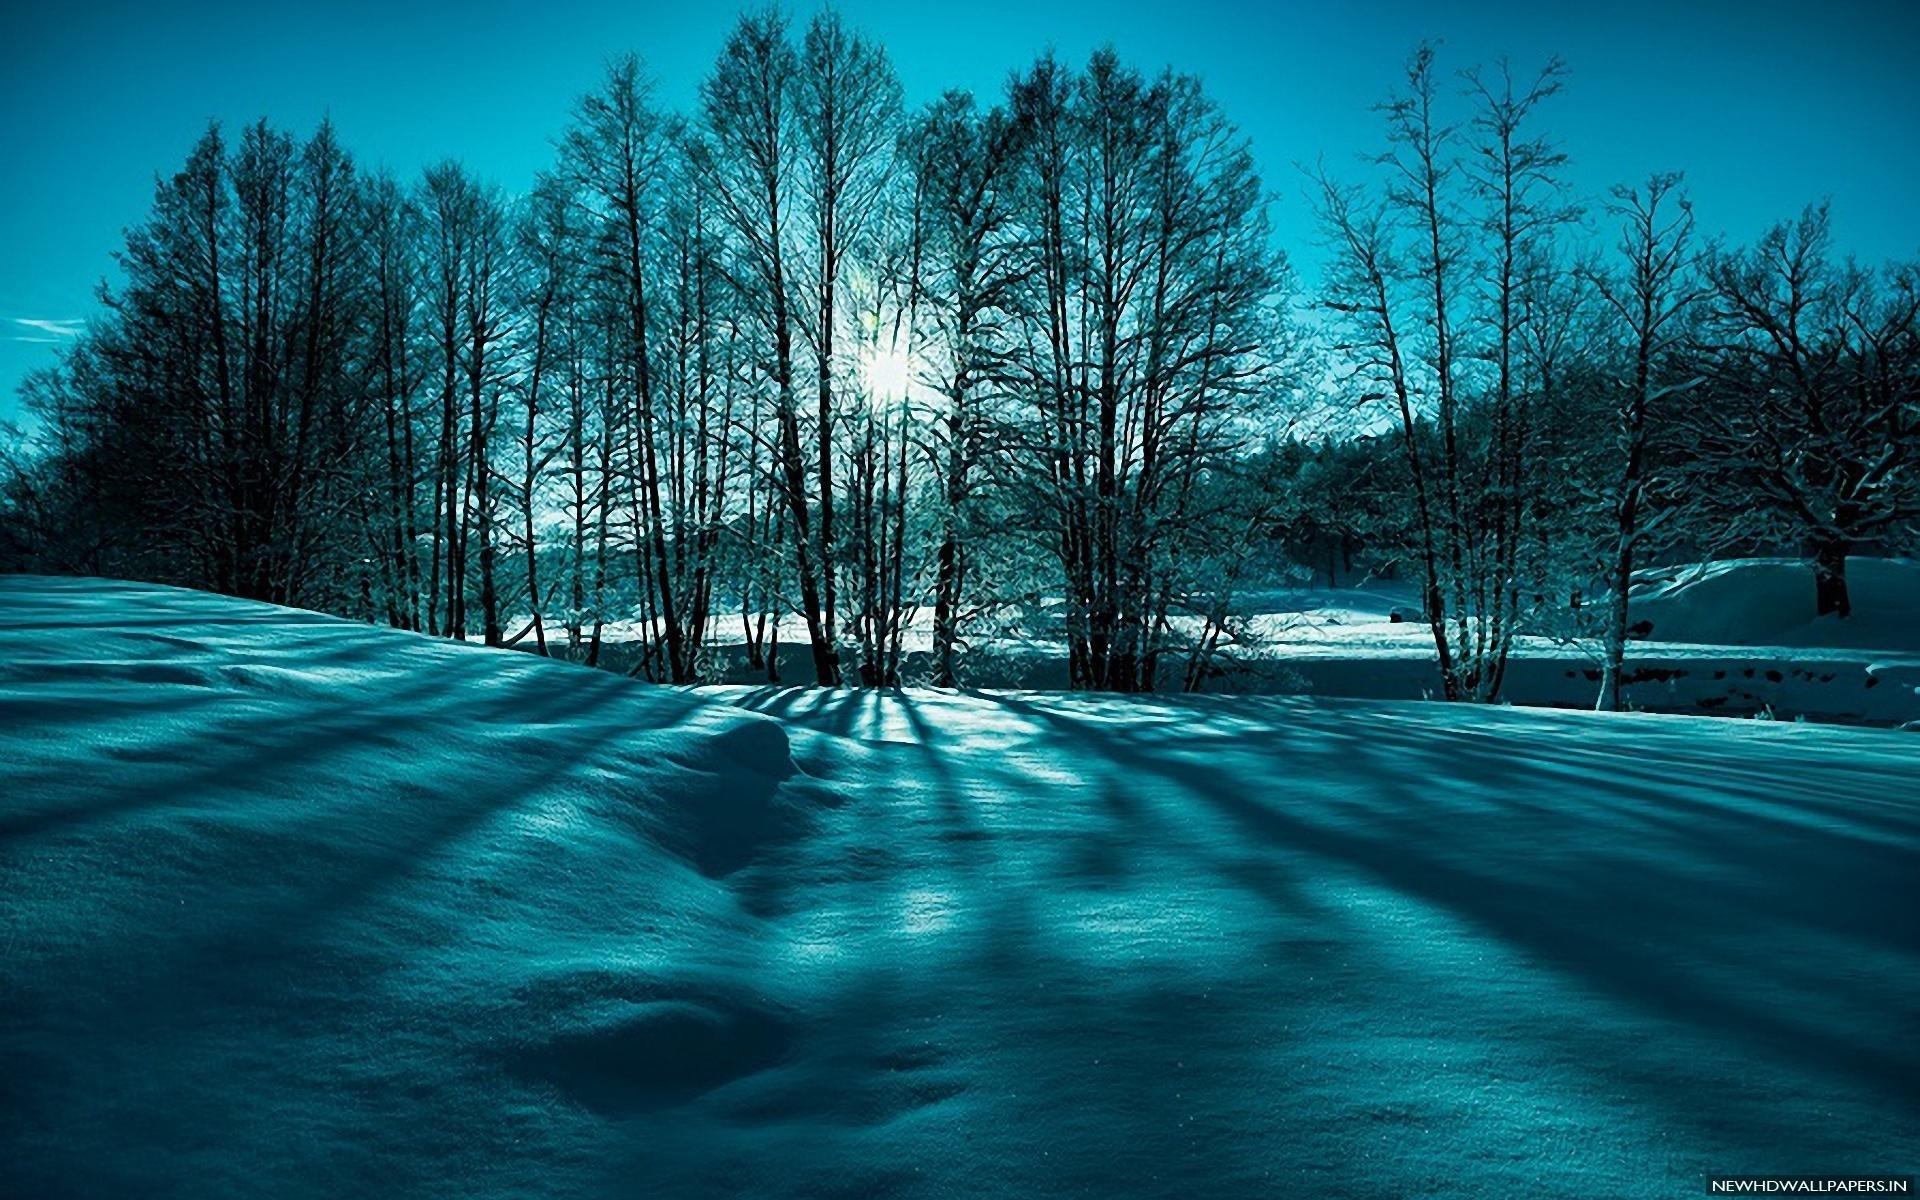 Hd winter landscape wallpapers wallpapersafari - Wallpaper hd nature winter ...